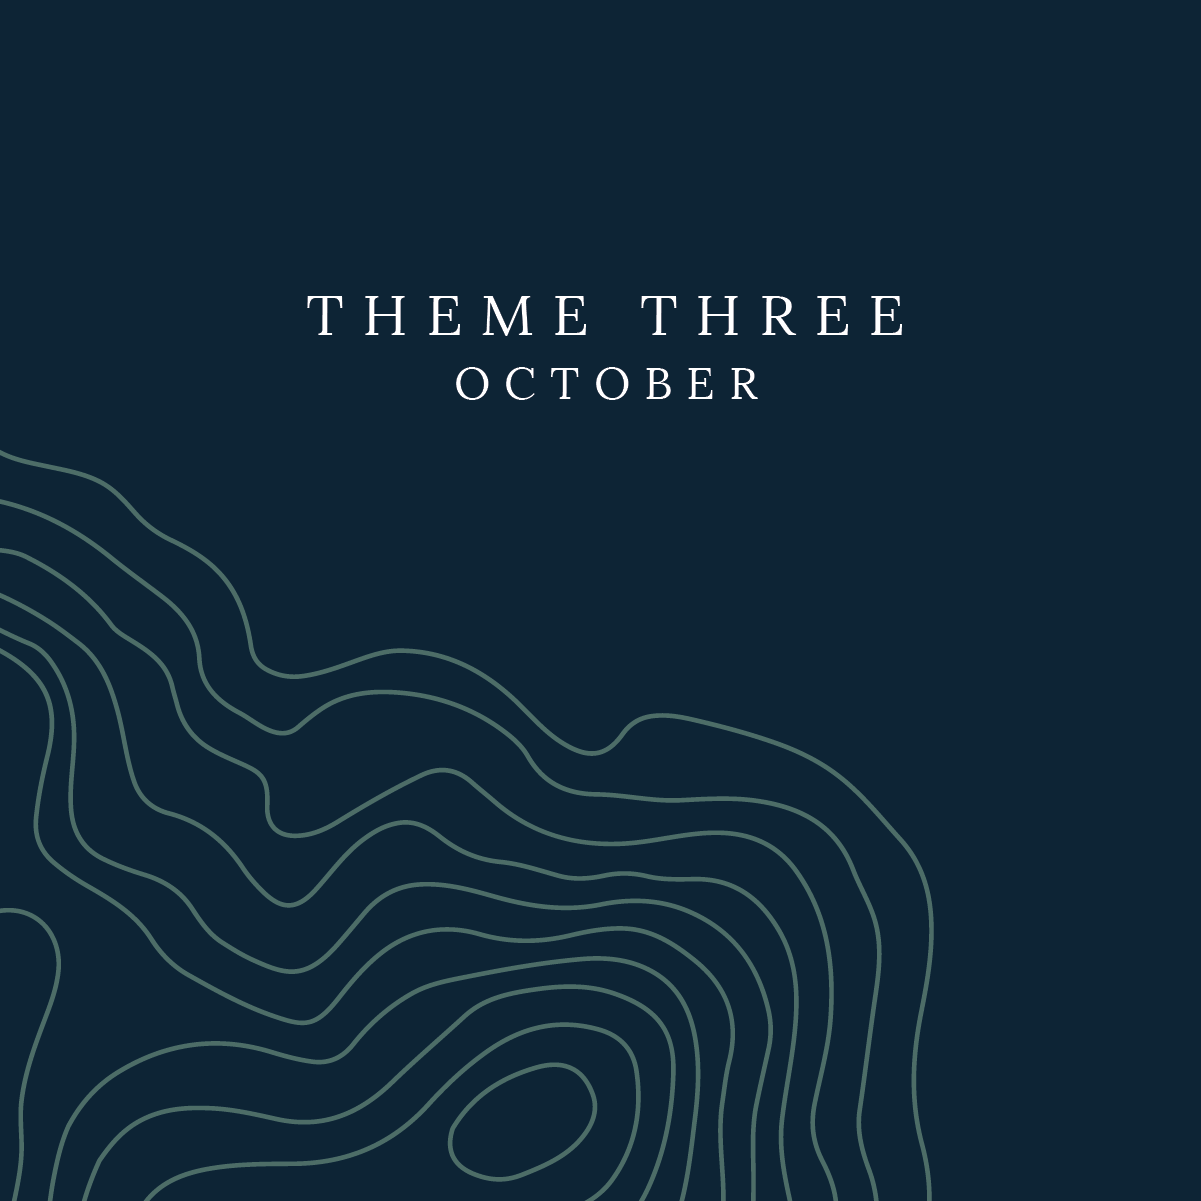 October Theme Thumbnails-10.png